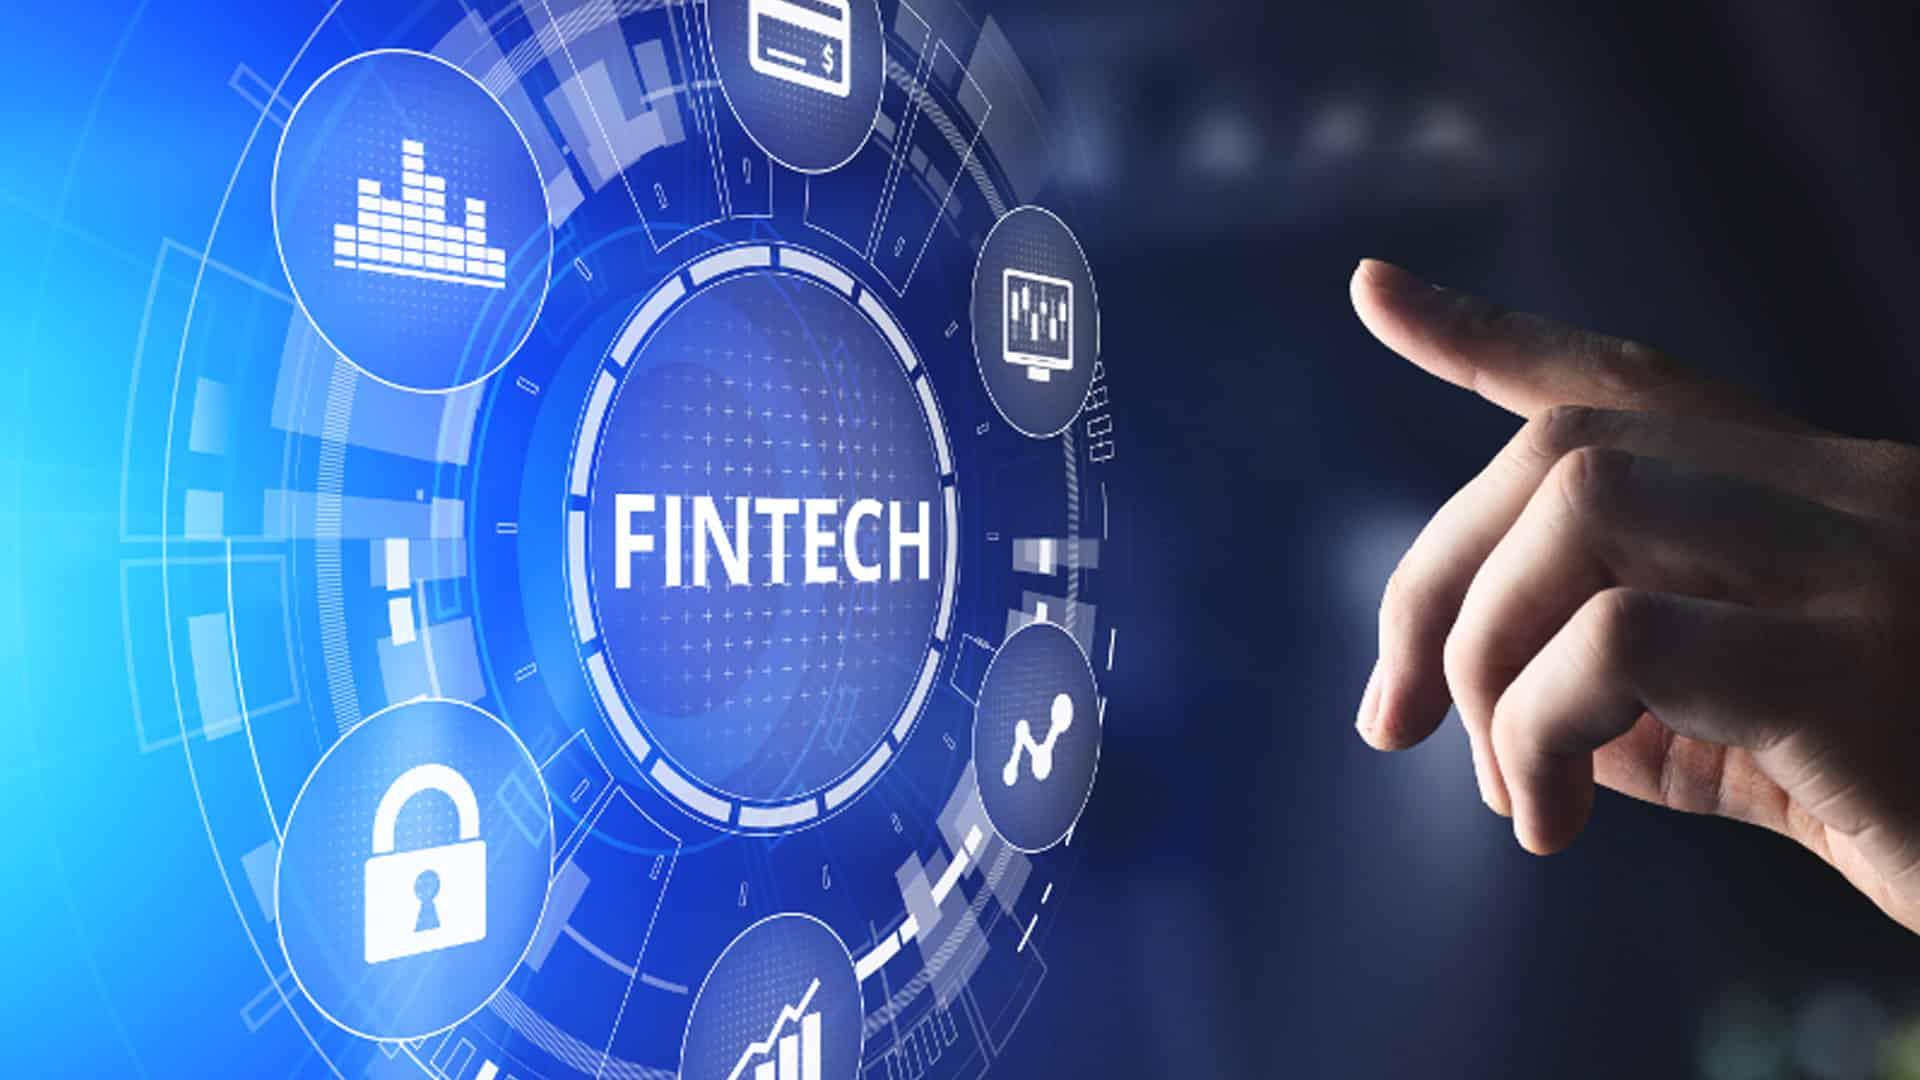 financial services, fintech ipo bids